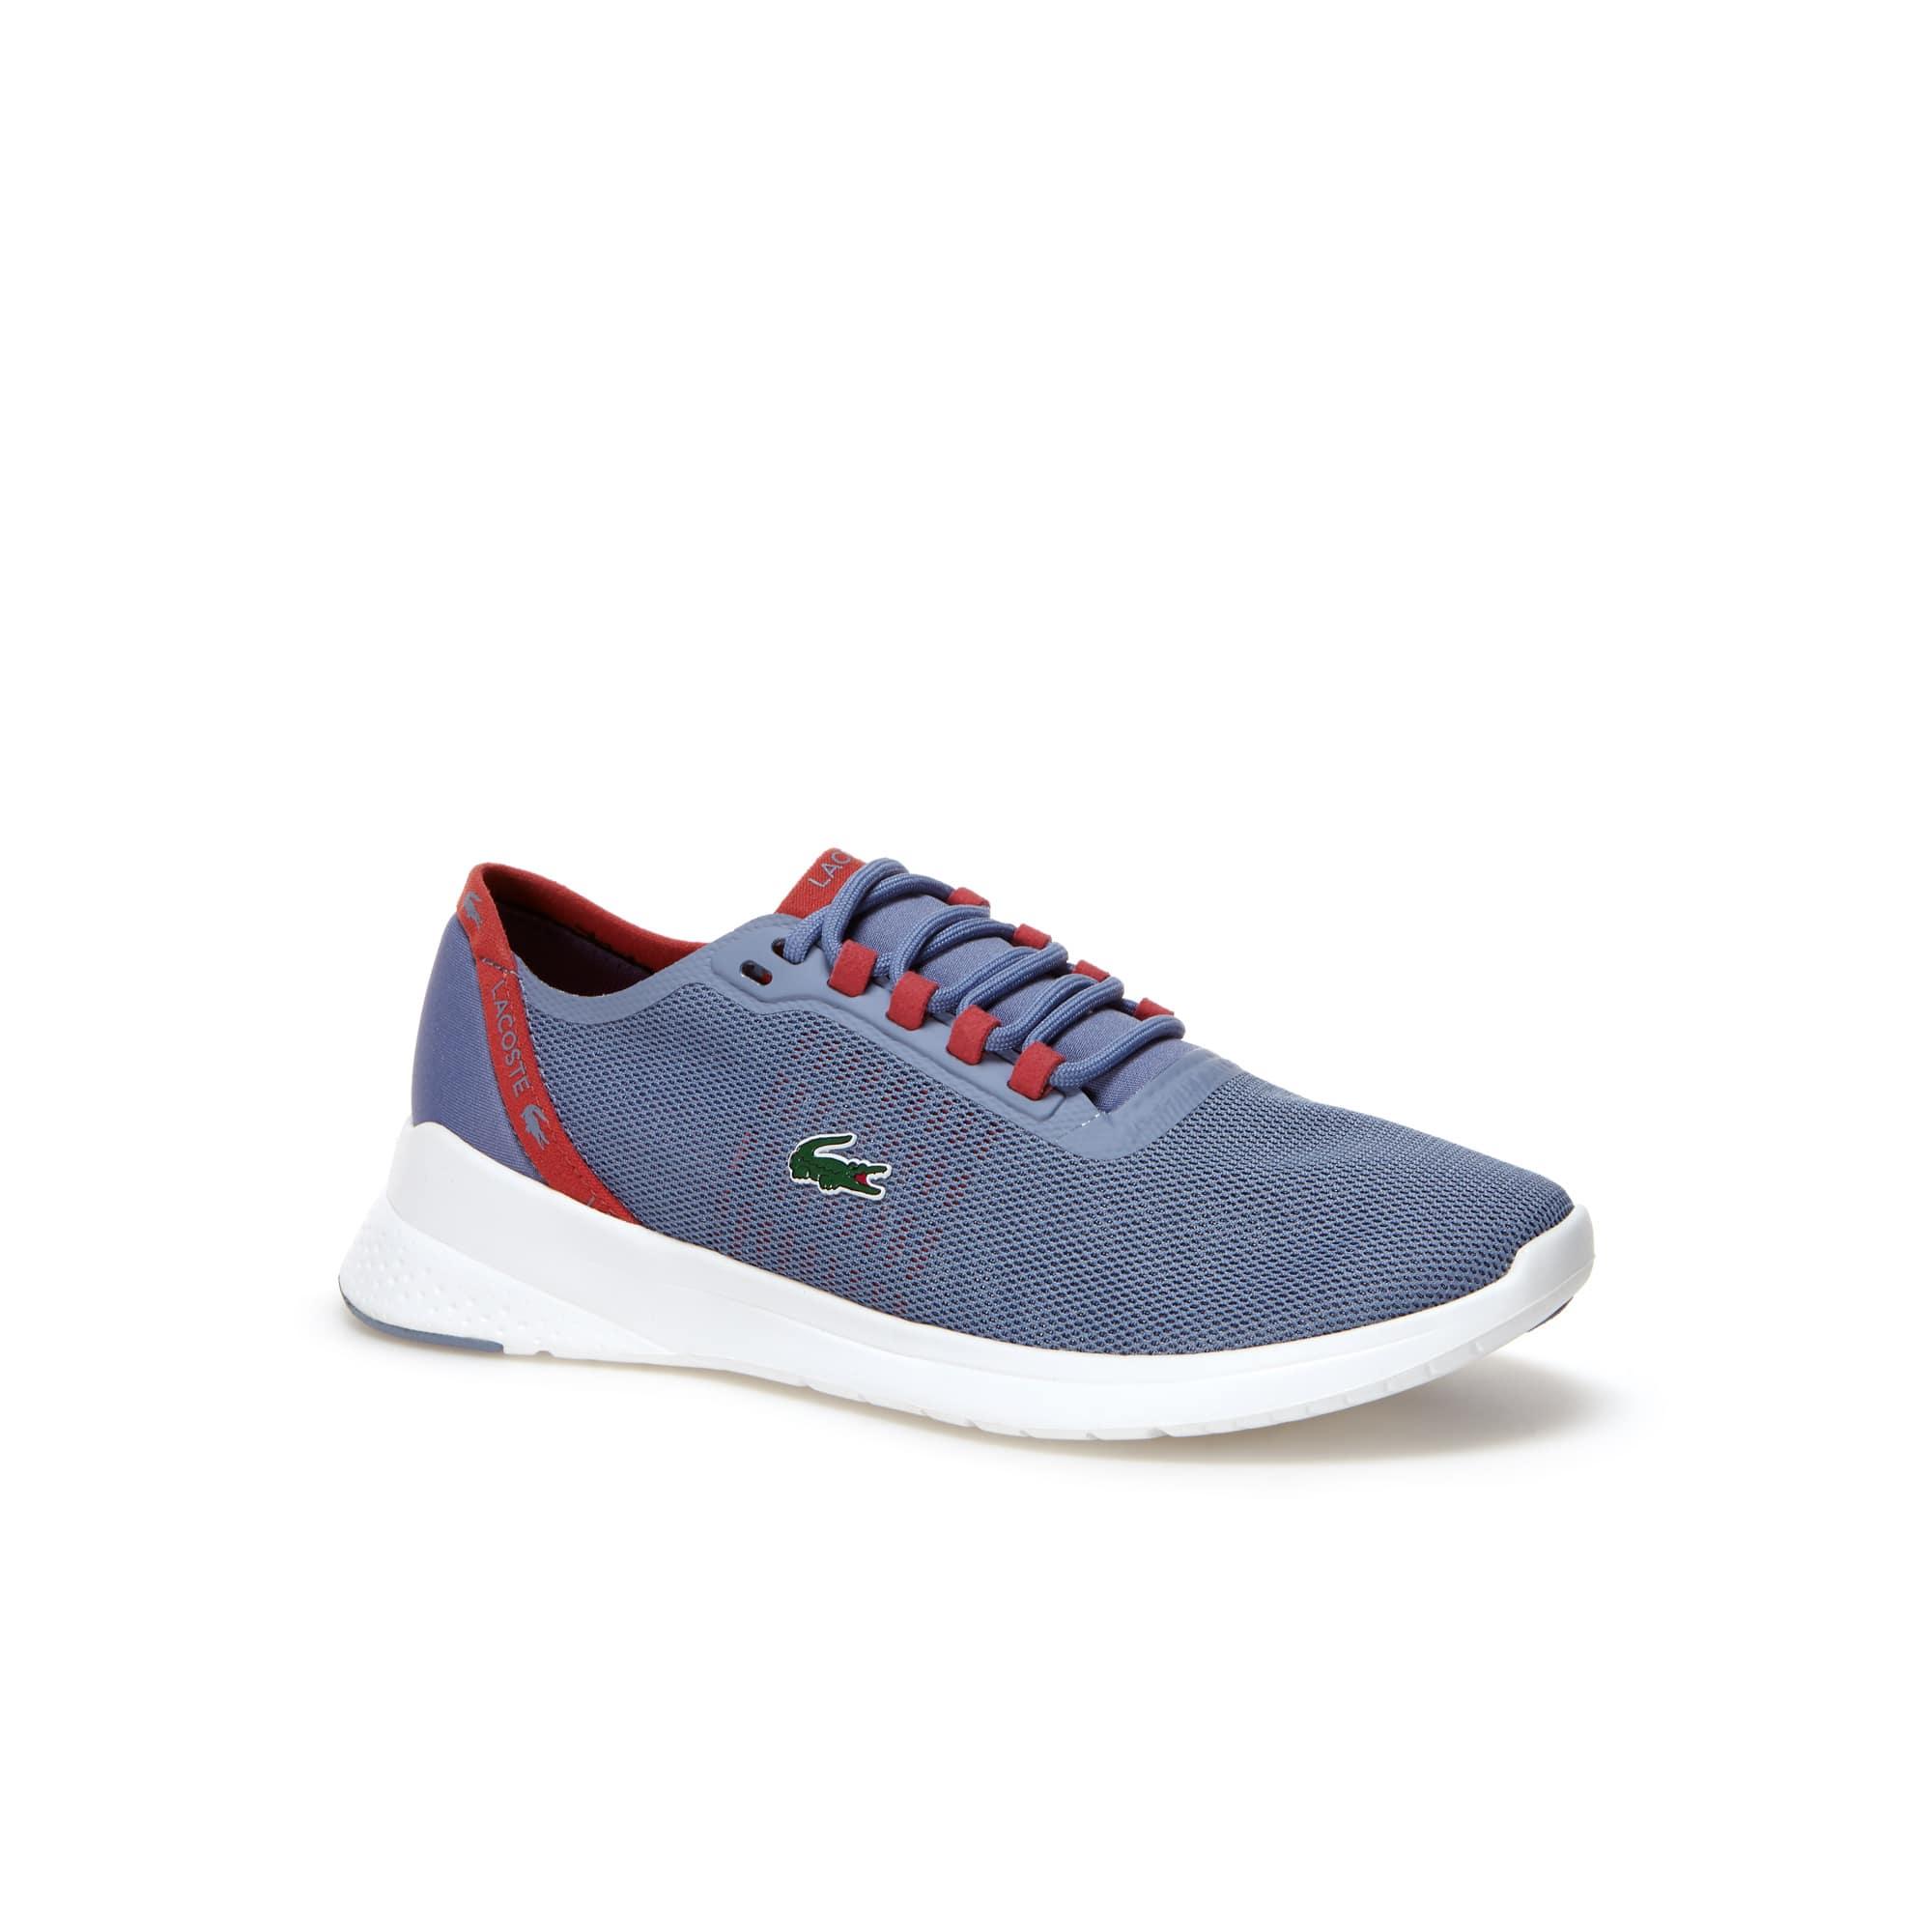 Damen-Sneakers LT FIT aus Stoff